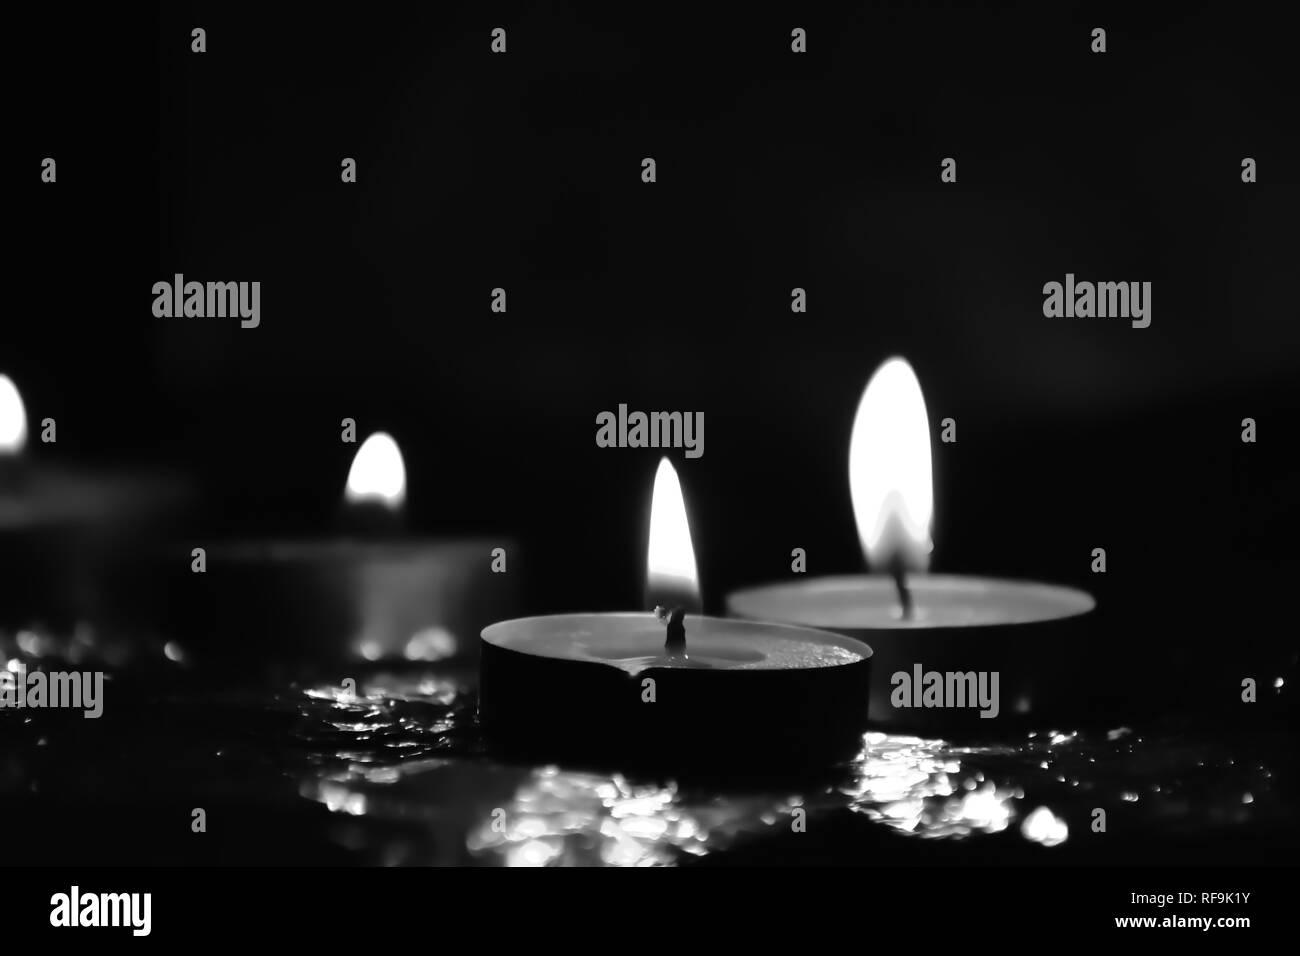 Beautiful Tea candle light glowing in darkness - Stock Image